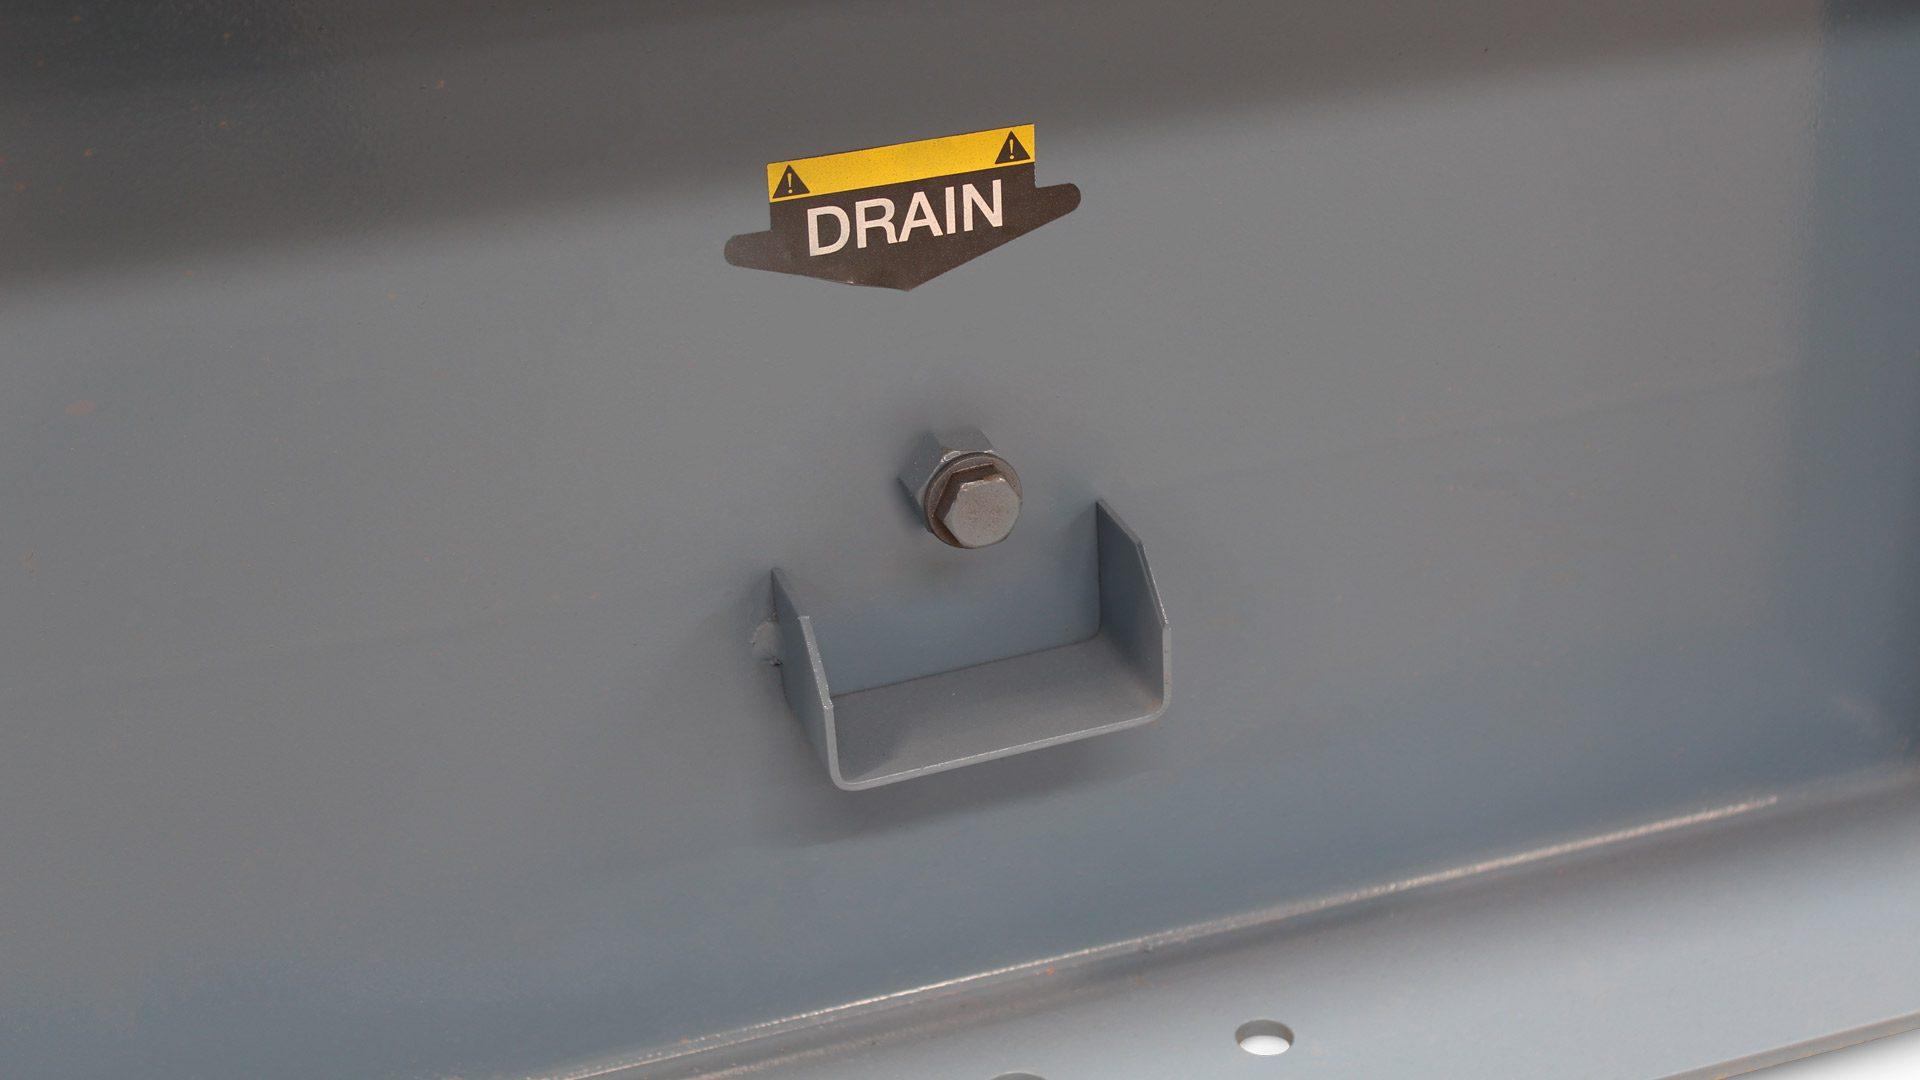 Drain on Evopower generator